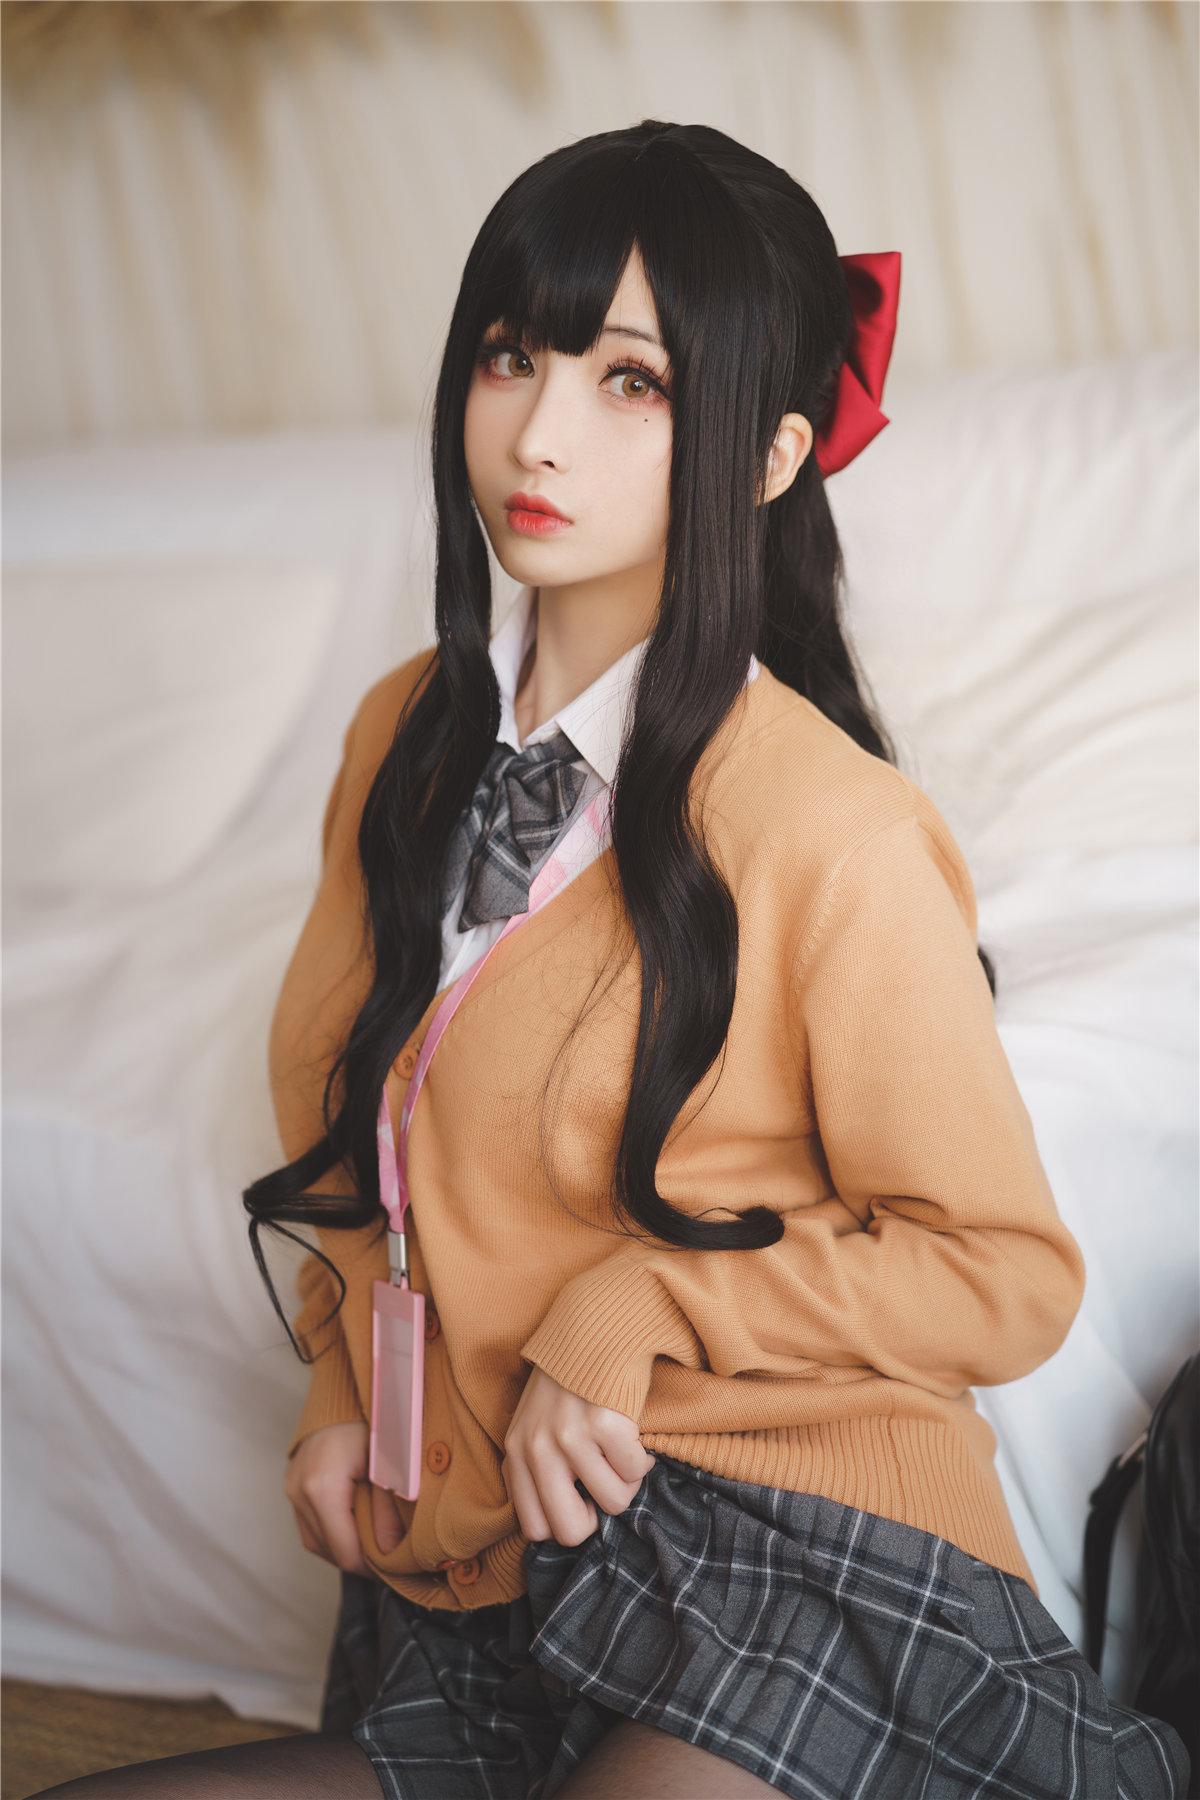 rioko凉凉子 放课后的学姐主题写真